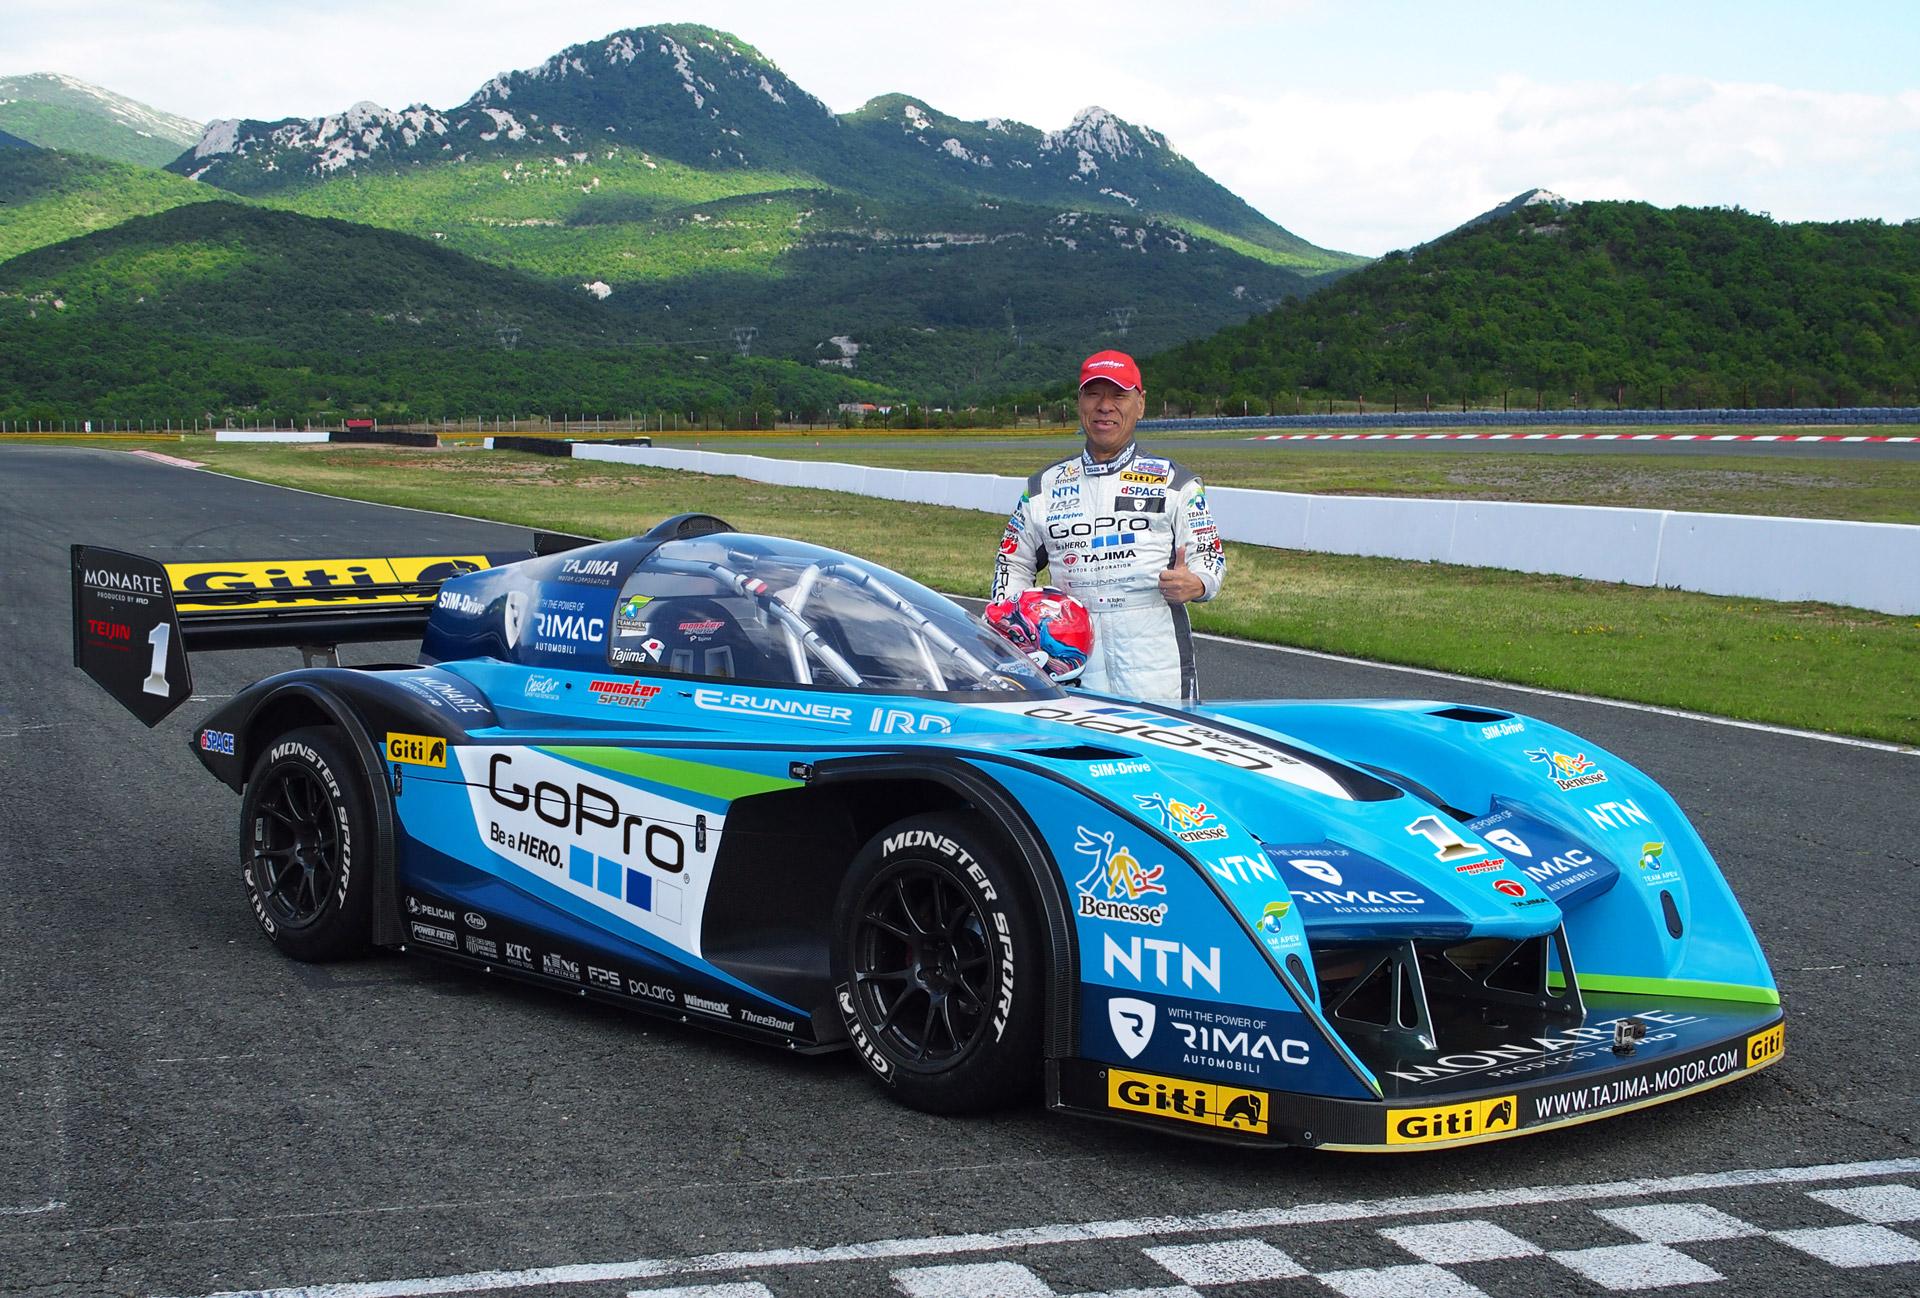 Uhiro Monster Tajima Teams Up With Rimac For Pikes Peak Electric Car Record